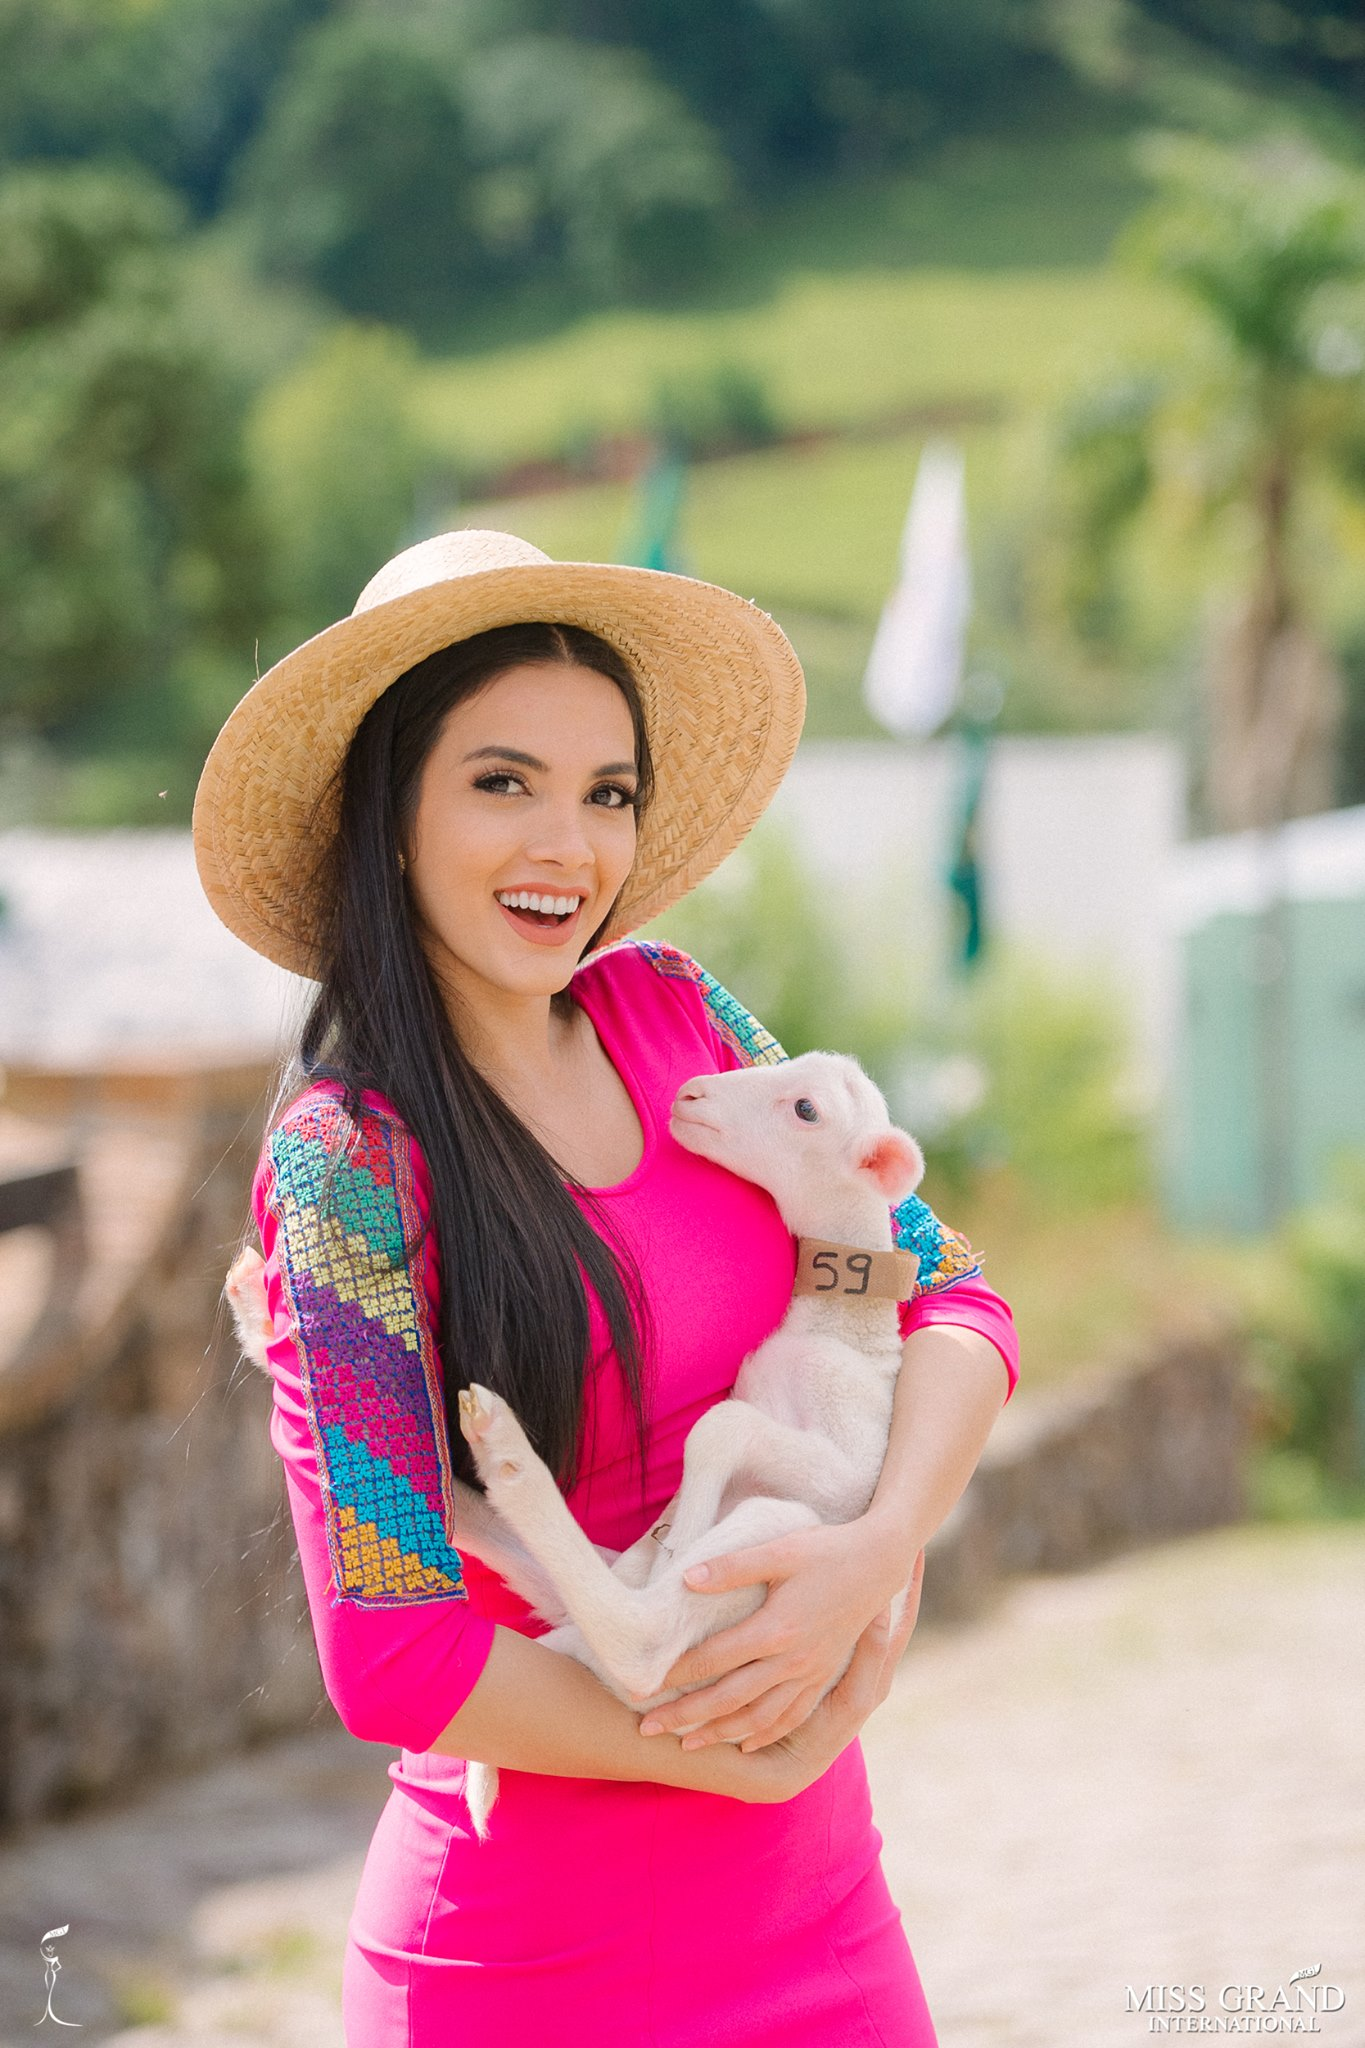 miss grand international 2018 visitando brasil para assistir a final de miss grand brasil 2019. - Página 3 Alnulhdv